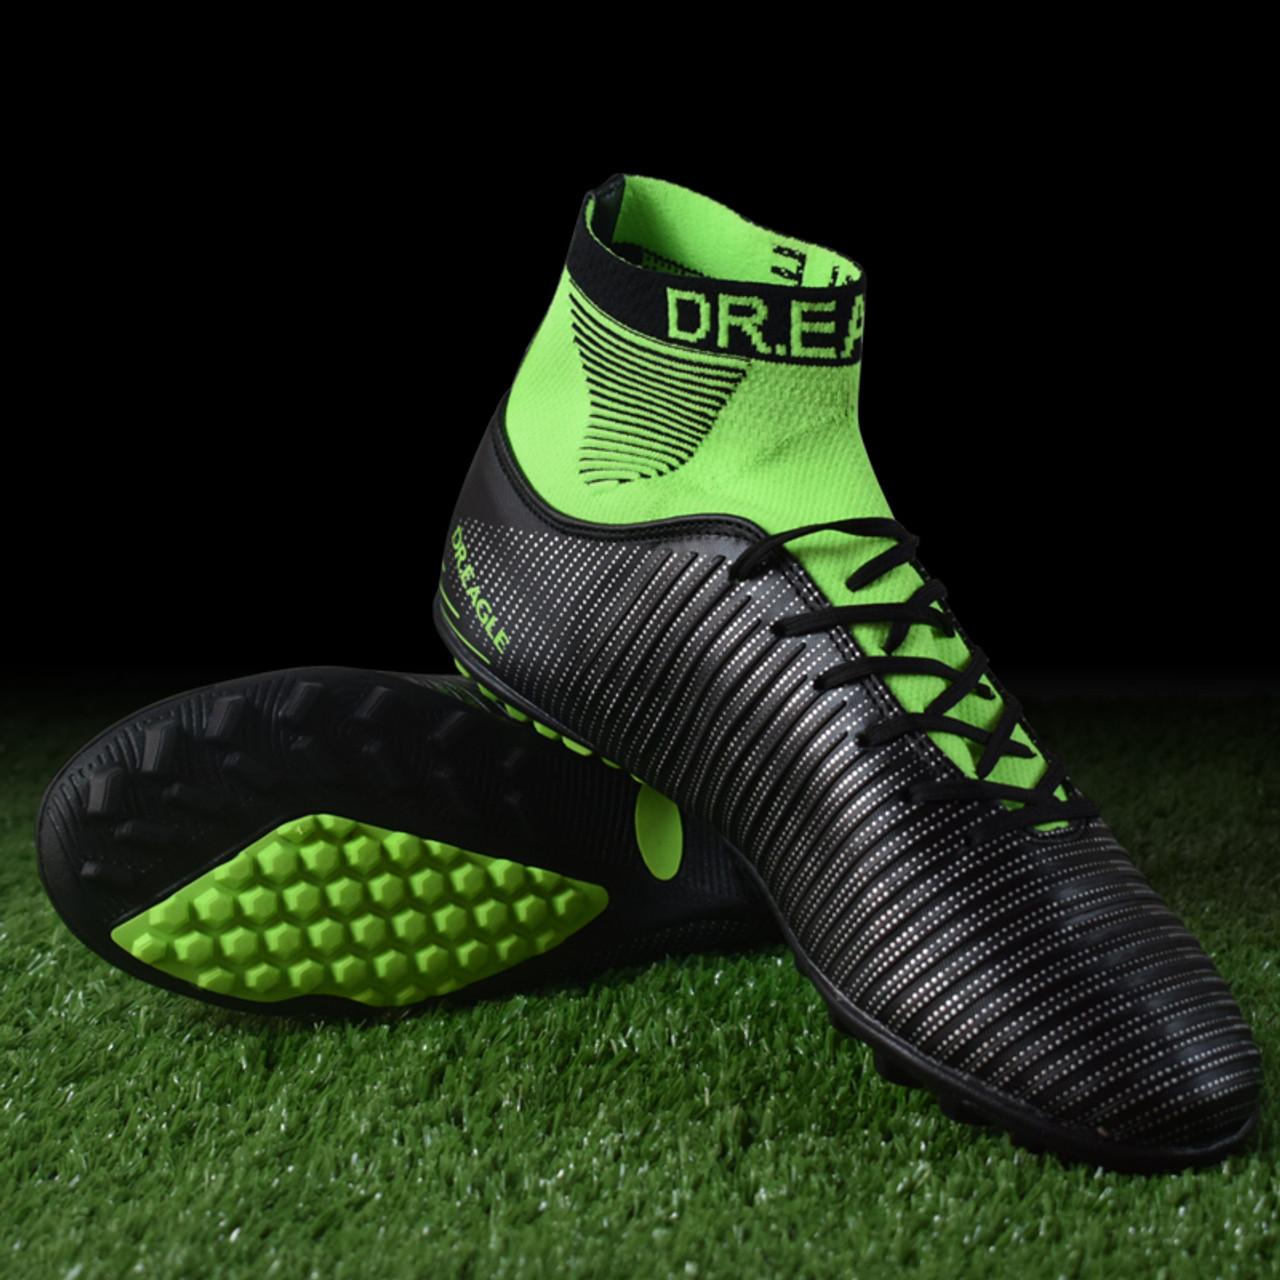 f1a549334 EAGLE TF/ turf Indoor high ankle soccer cleats football shoes futsal  Footballs Sock ...